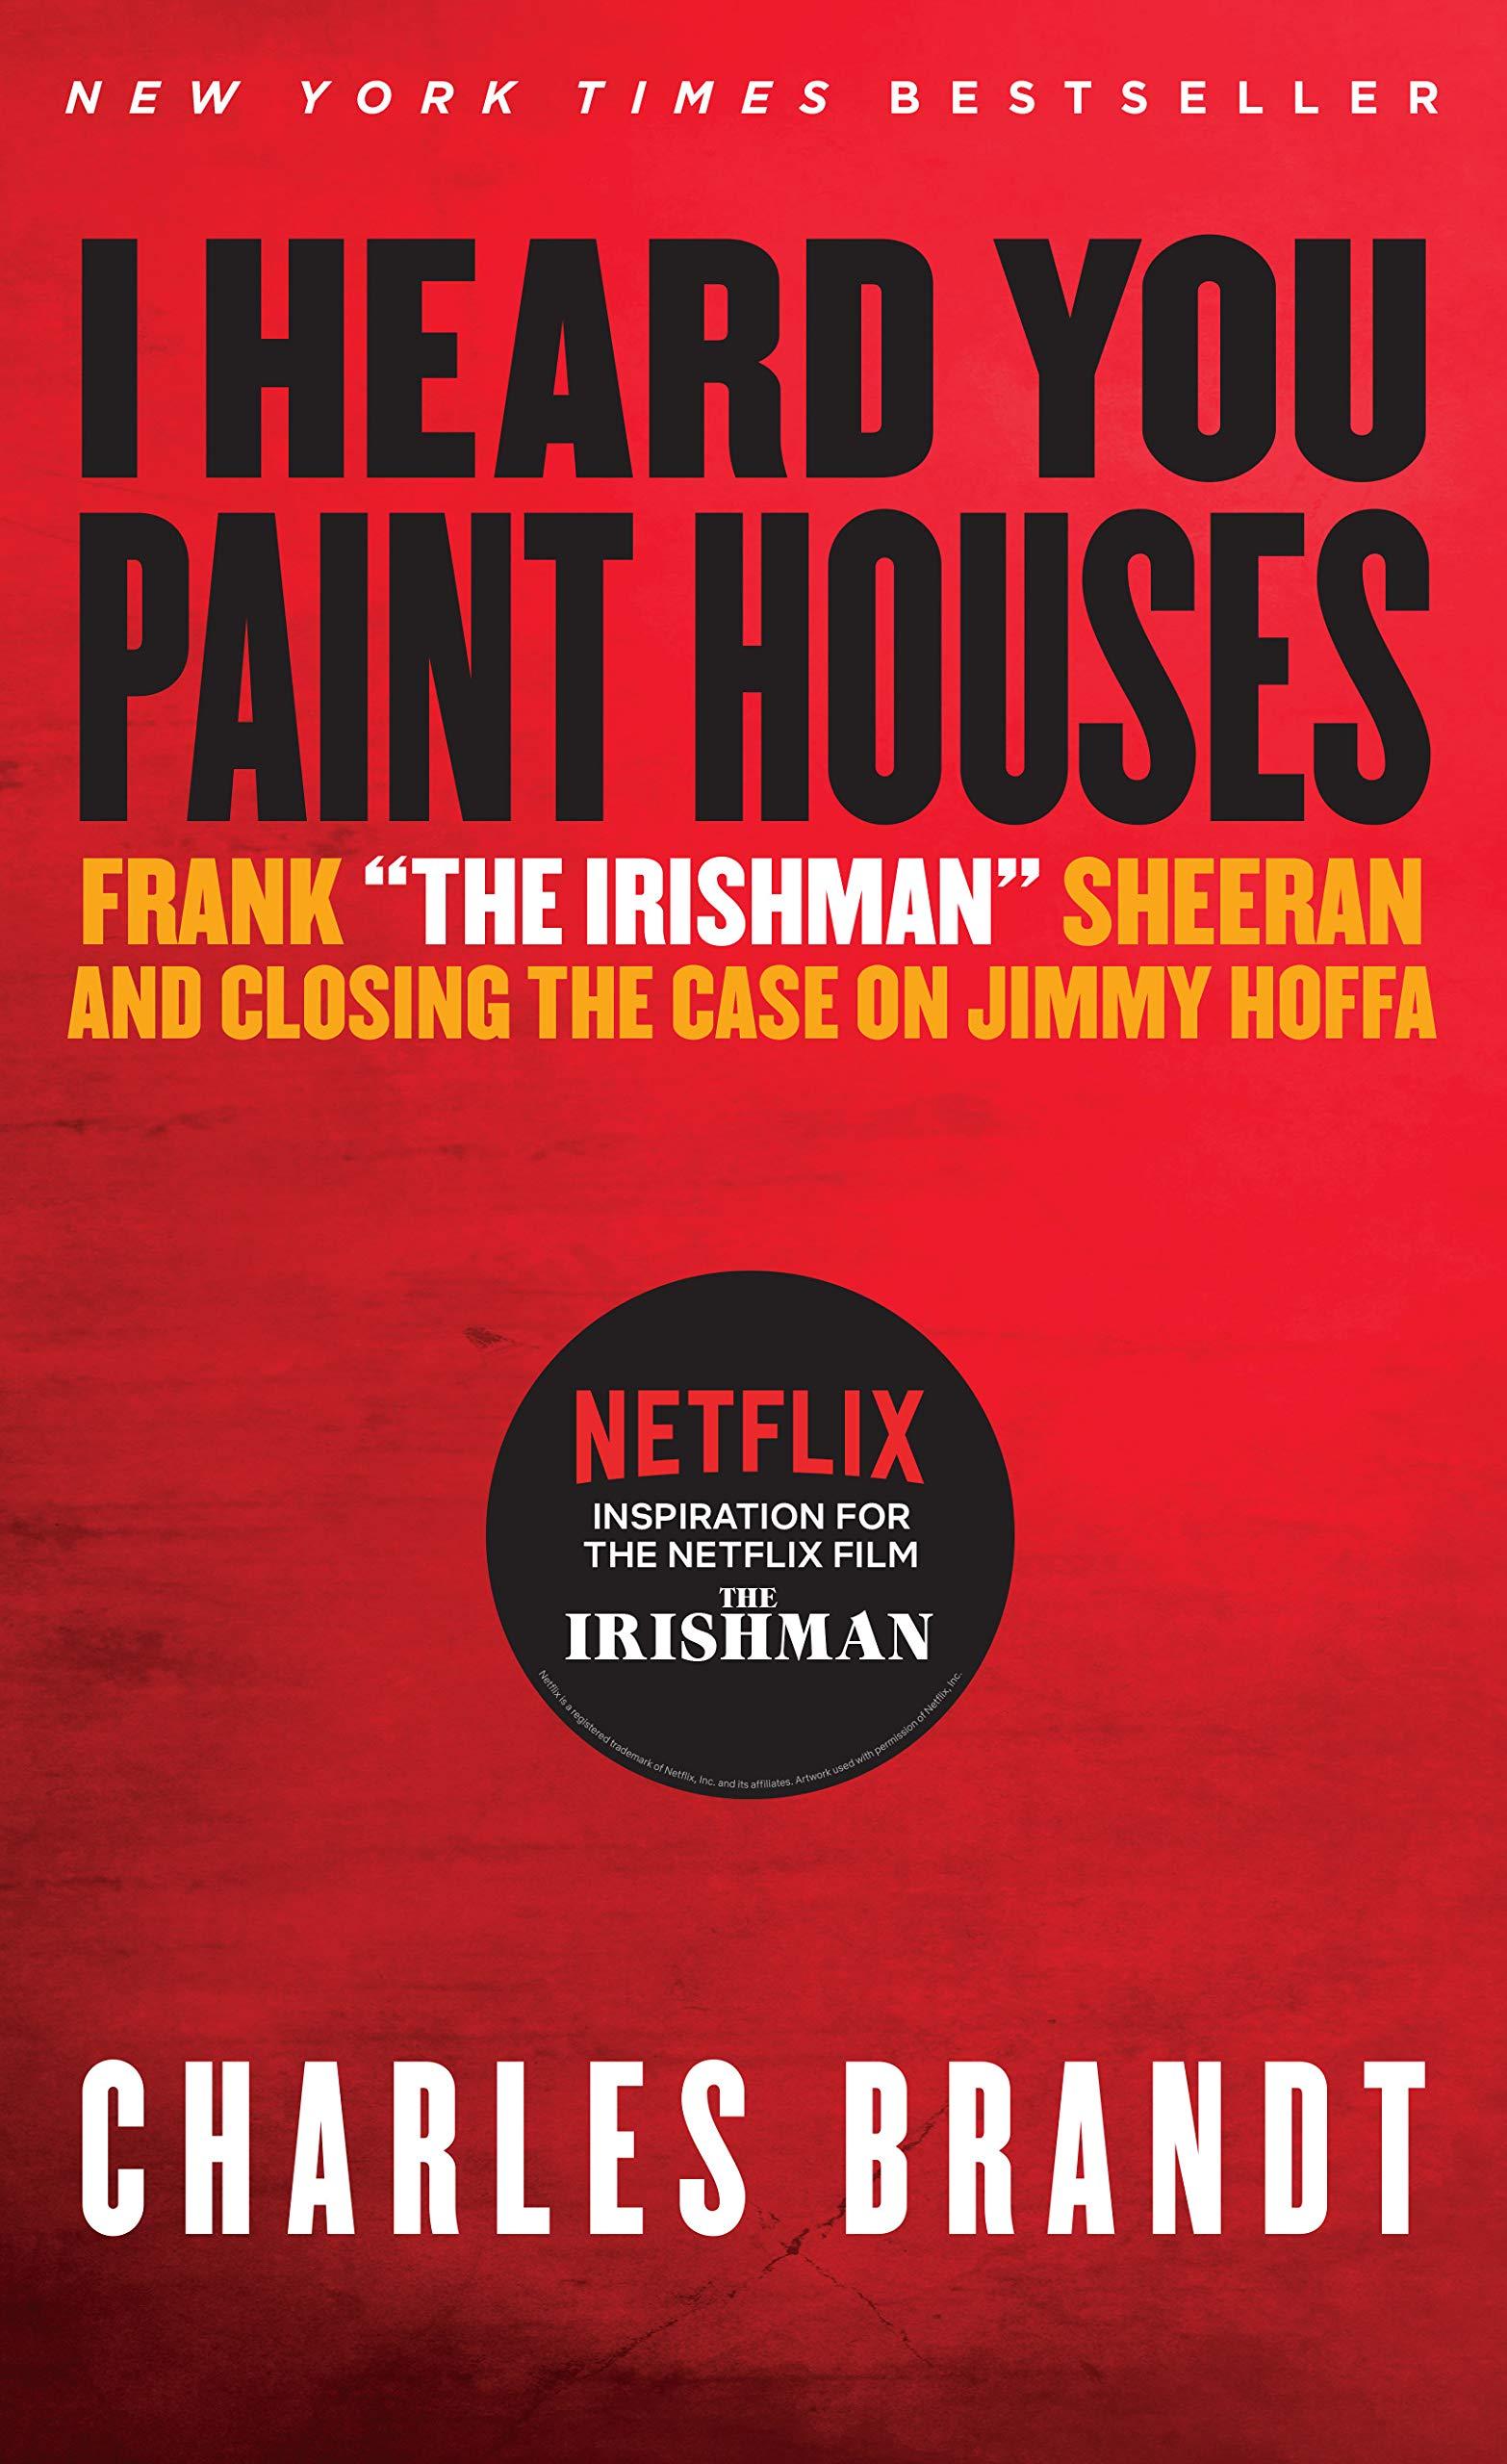 I HEARD YOU PAINT HOUSES: Amazon.es: CHARLES BRANDT: Libros ...